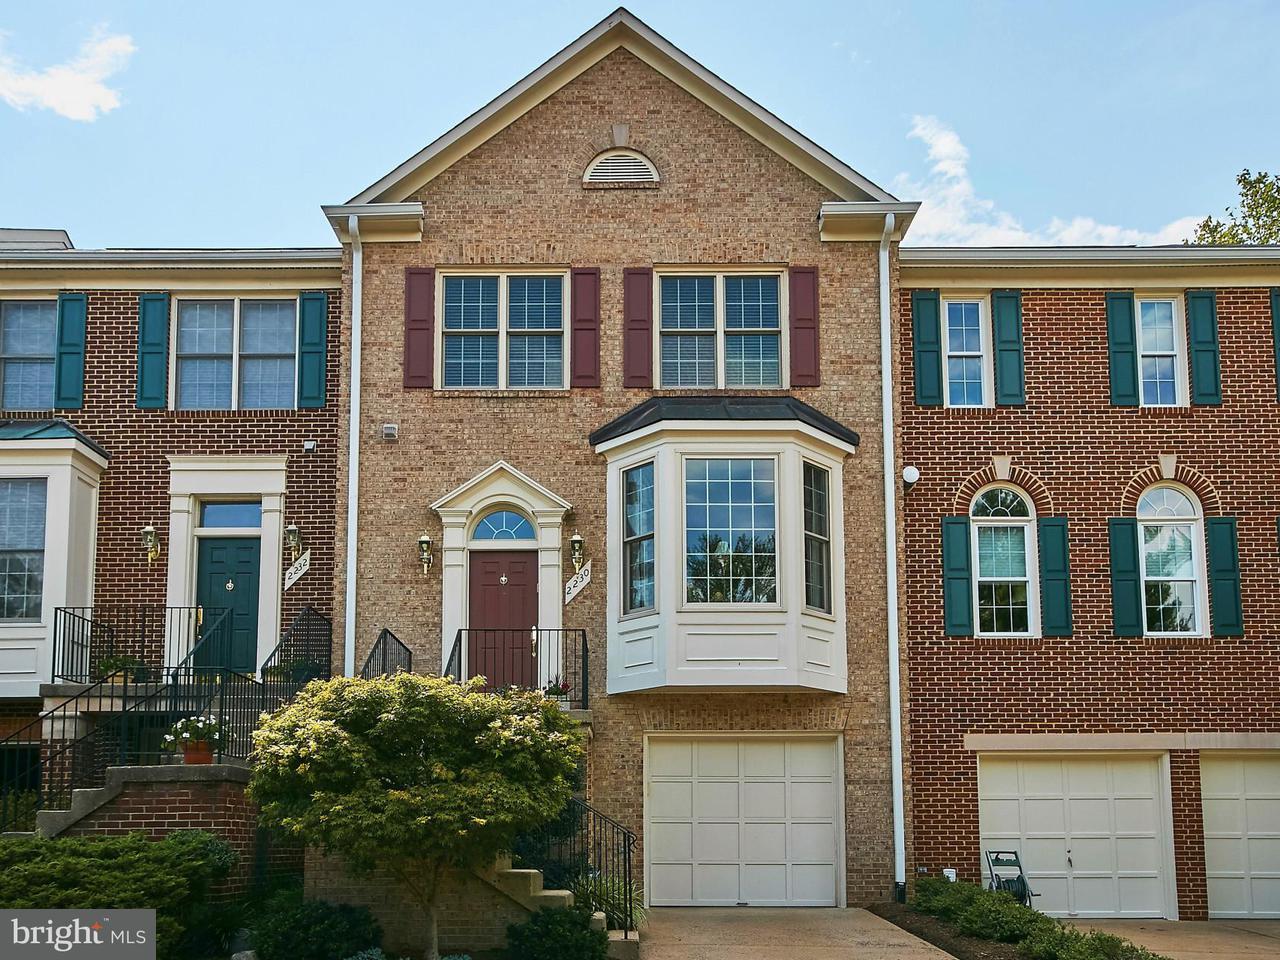 Casa unifamiliar adosada (Townhouse) por un Venta en 2230 JOURNET Drive 2230 JOURNET Drive Dunn Loring, Virginia 22027 Estados Unidos